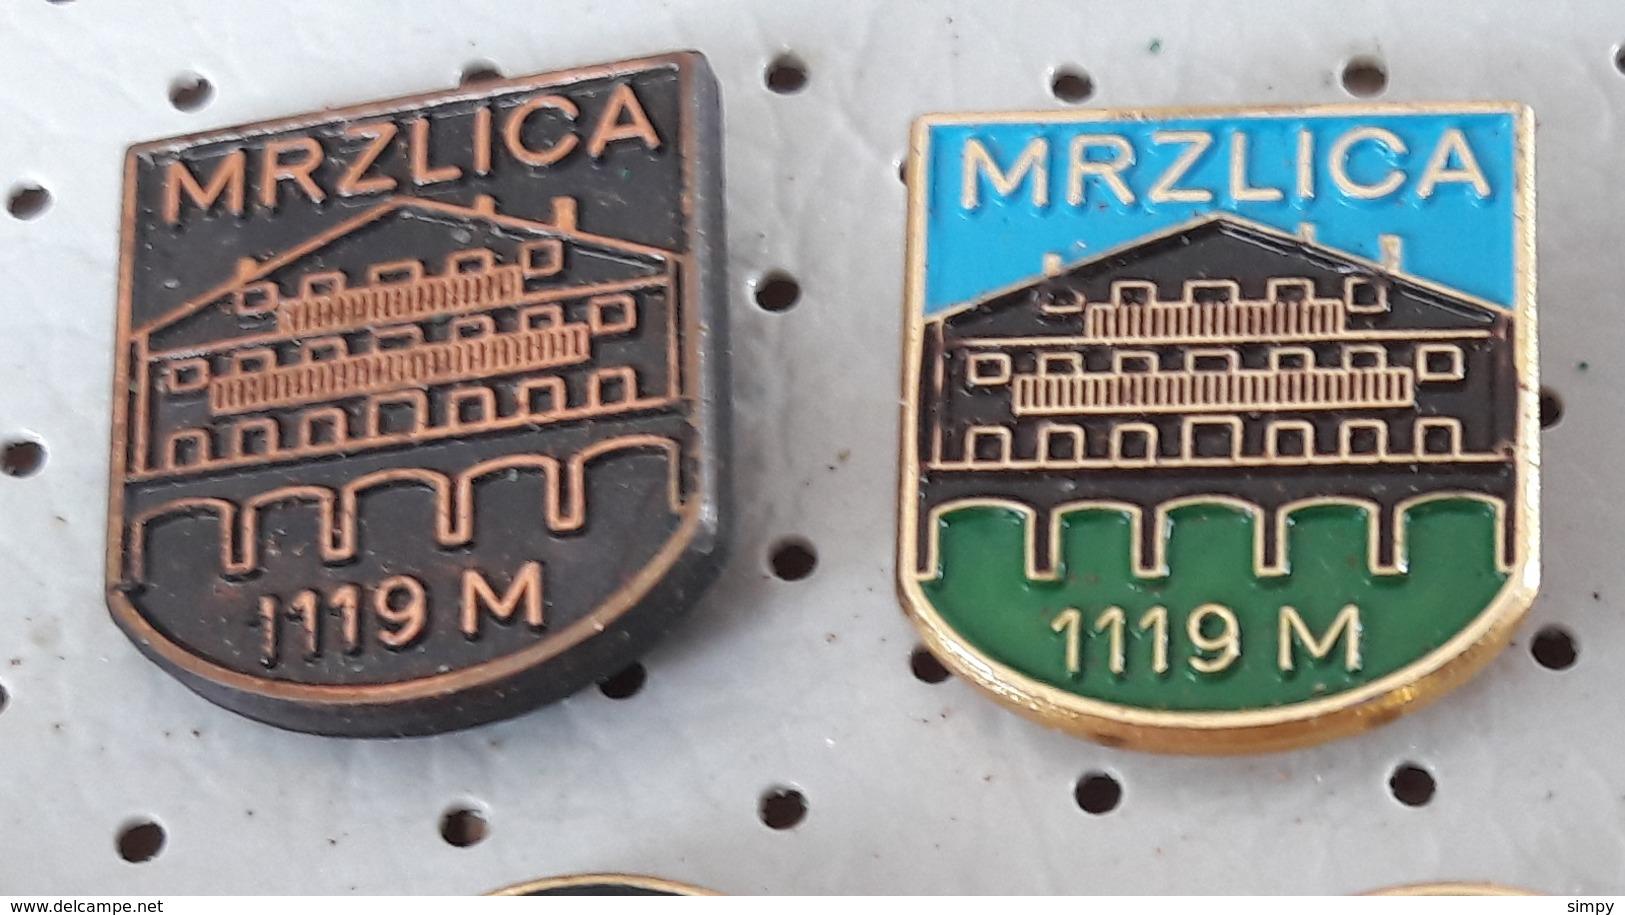 MRZLICA 1119 M Mountain Lodge Alpinism, Mountaineering, Slovenia Pins - Alpinism, Mountaineering